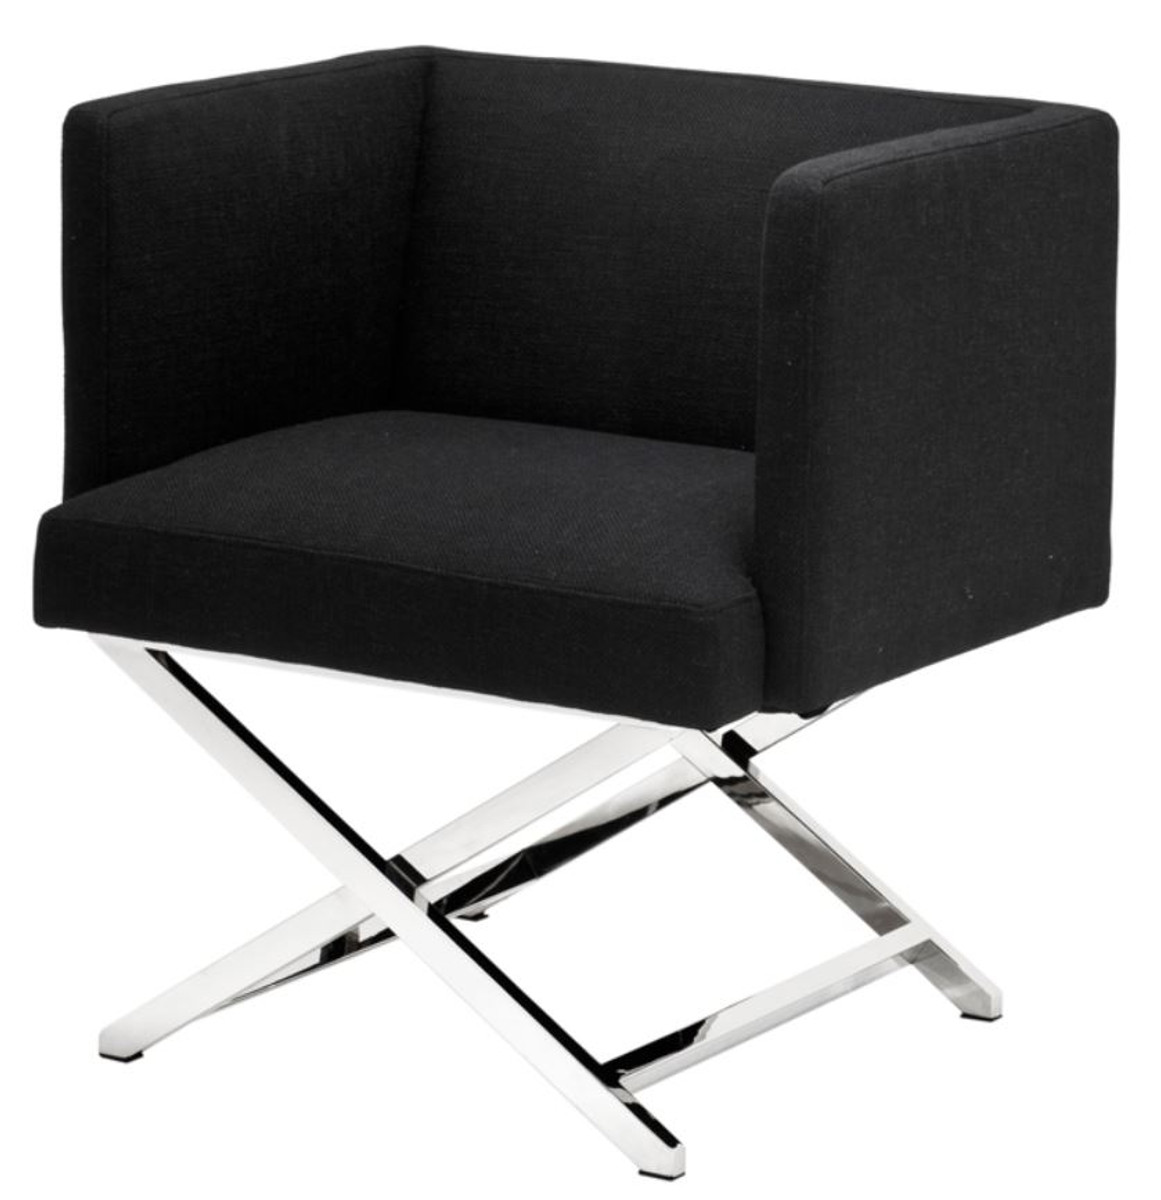 Casa Padrino Luxus Club Sessel in silber / schwarz 66 x 57 x H. 74 cm - Art Deco Möbel 1